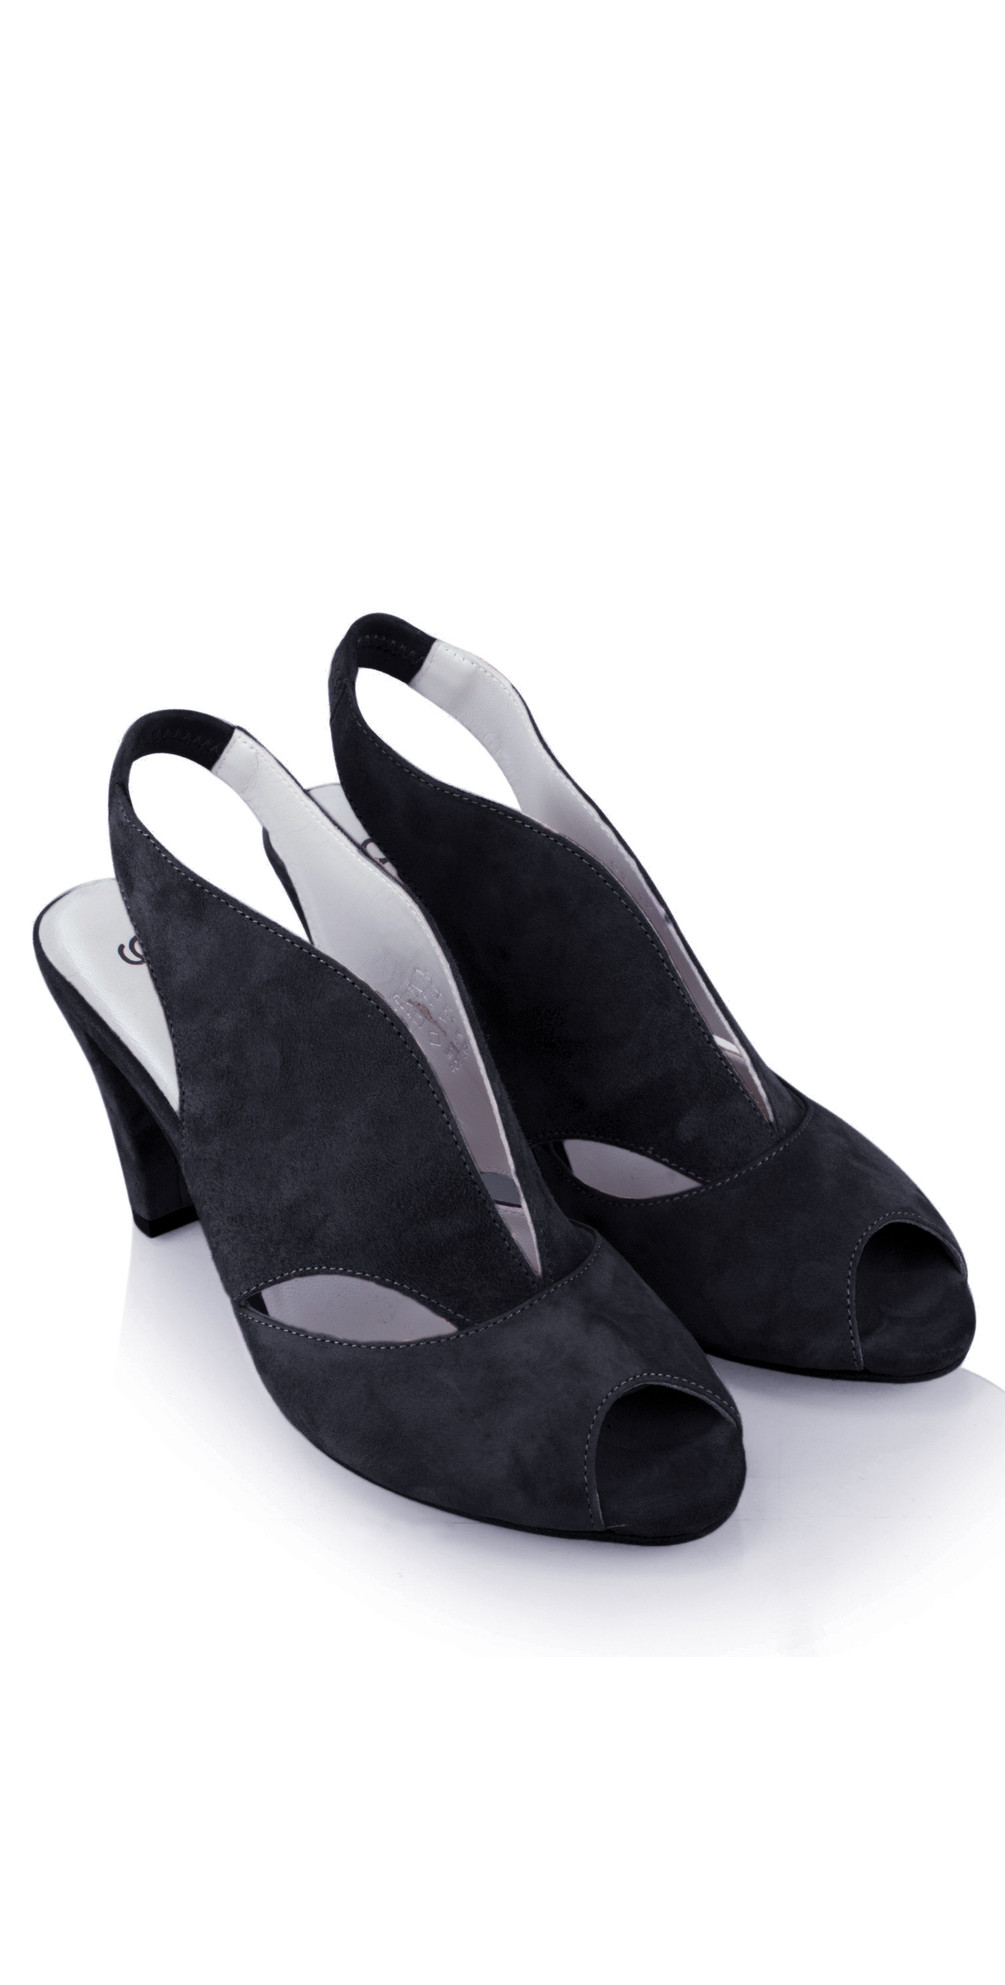 Valencia Navy Suede Sandal Shoe main image